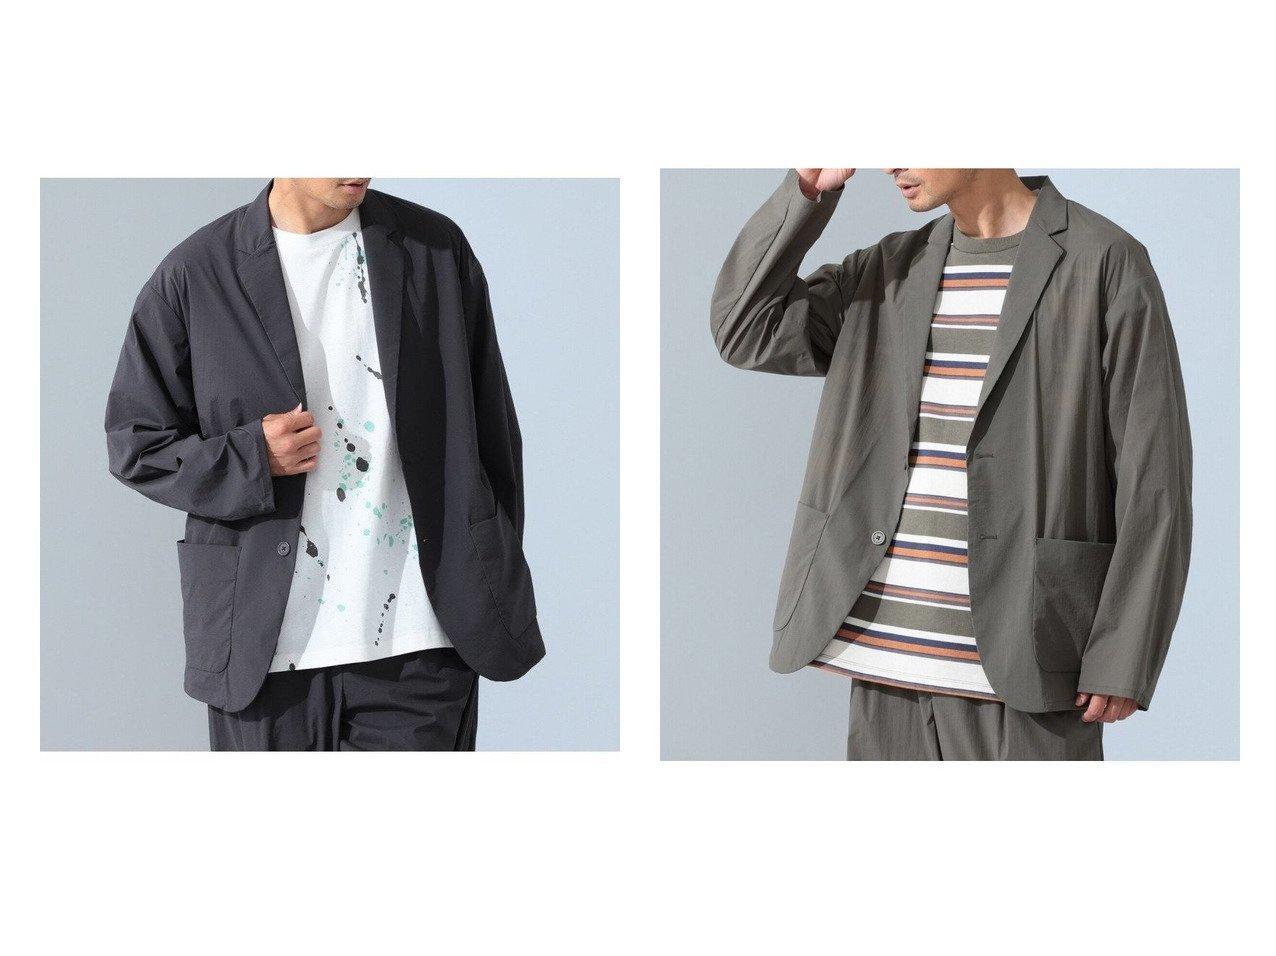 【B:MING by BEAMS / MEN/ビーミング バイ ビームス】のストレッチナイロン イージージャケット(セットアップ対応) 【MEN】おすすめ!人気トレンド・男性、メンズファッションの通販   おすすめで人気の流行・トレンド、ファッションの通販商品 インテリア・家具・メンズファッション・キッズファッション・レディースファッション・服の通販 founy(ファニー) https://founy.com/ ファッション Fashion メンズファッション MEN セットアップ Setup/Men ショルダー ジャケット ストレッチ セットアップ トレンド ドロップ バランス パッチ ファブリック フロント ポケット リップ リラックス 人気 軽量  ID:crp329100000060719